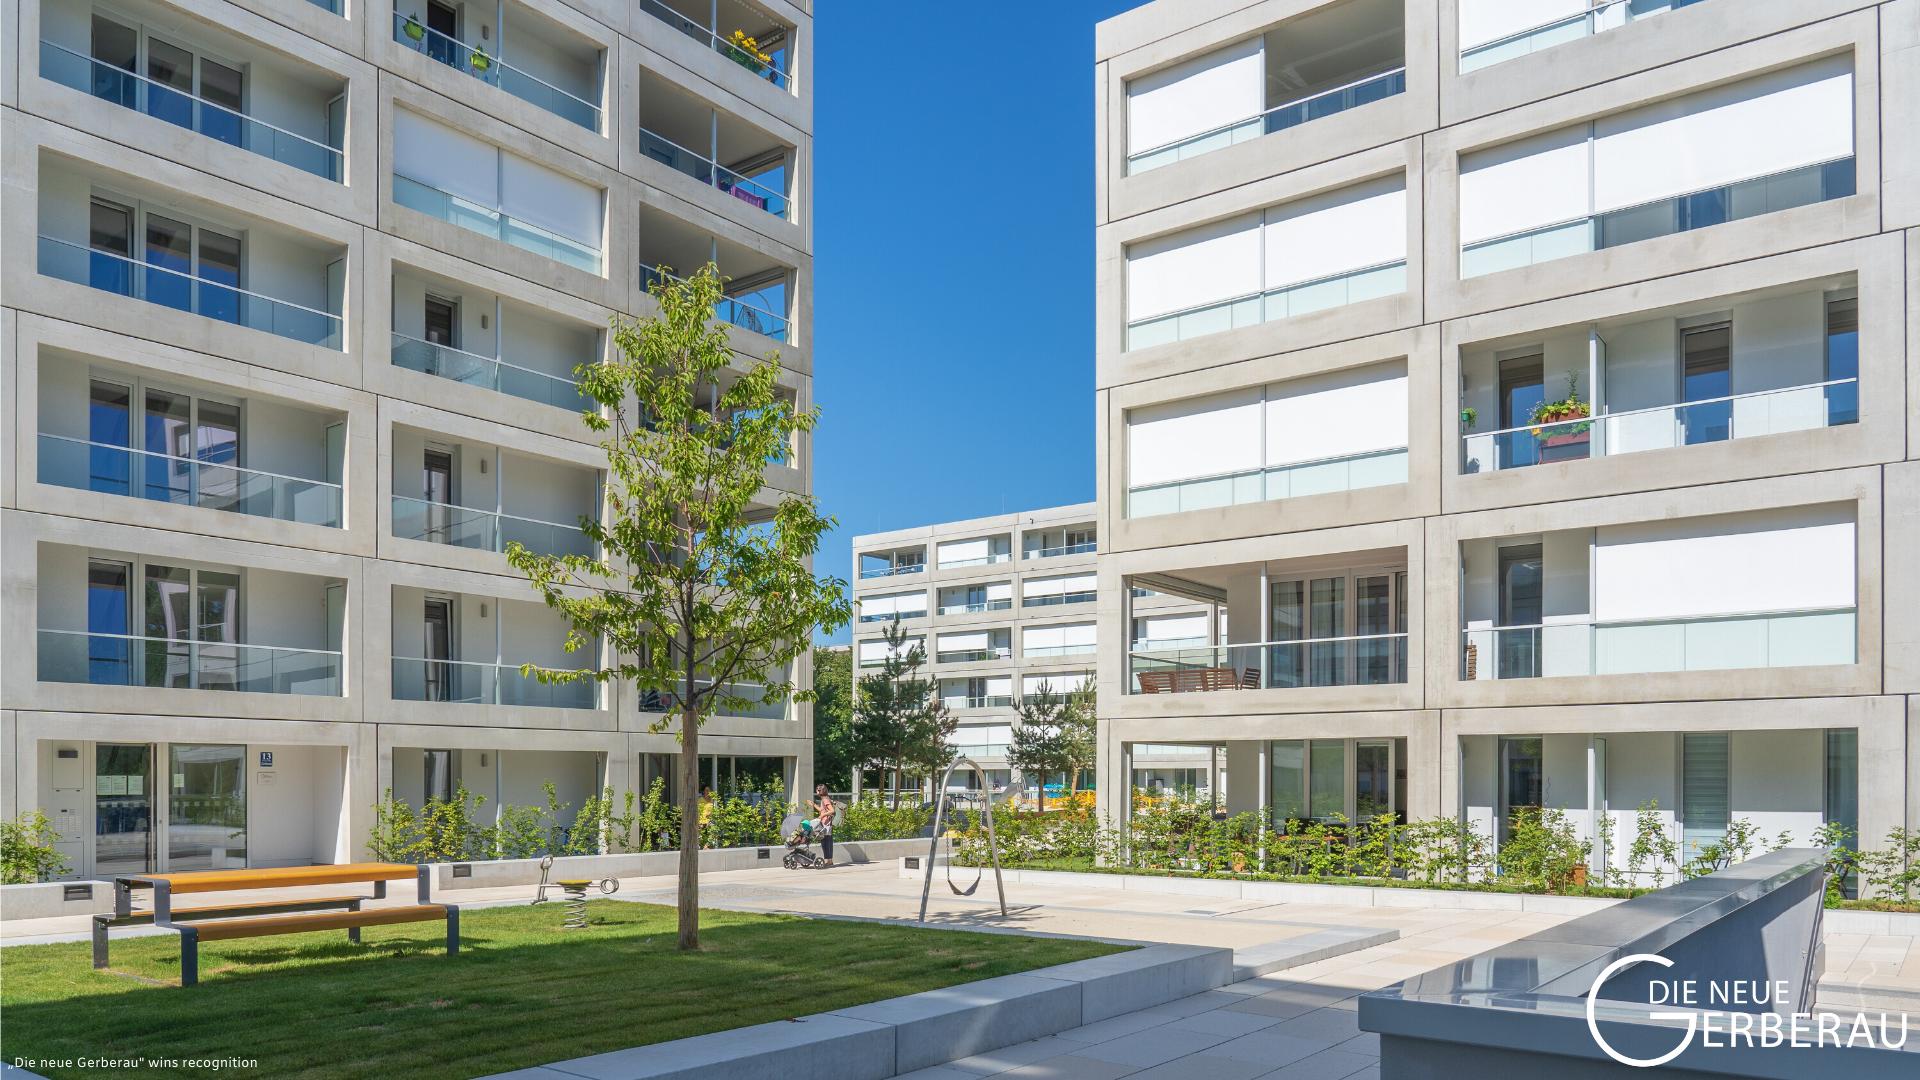 National Competition Wohnungsbau Bayern 2019: 'Die neue Gerberau' wins recognition